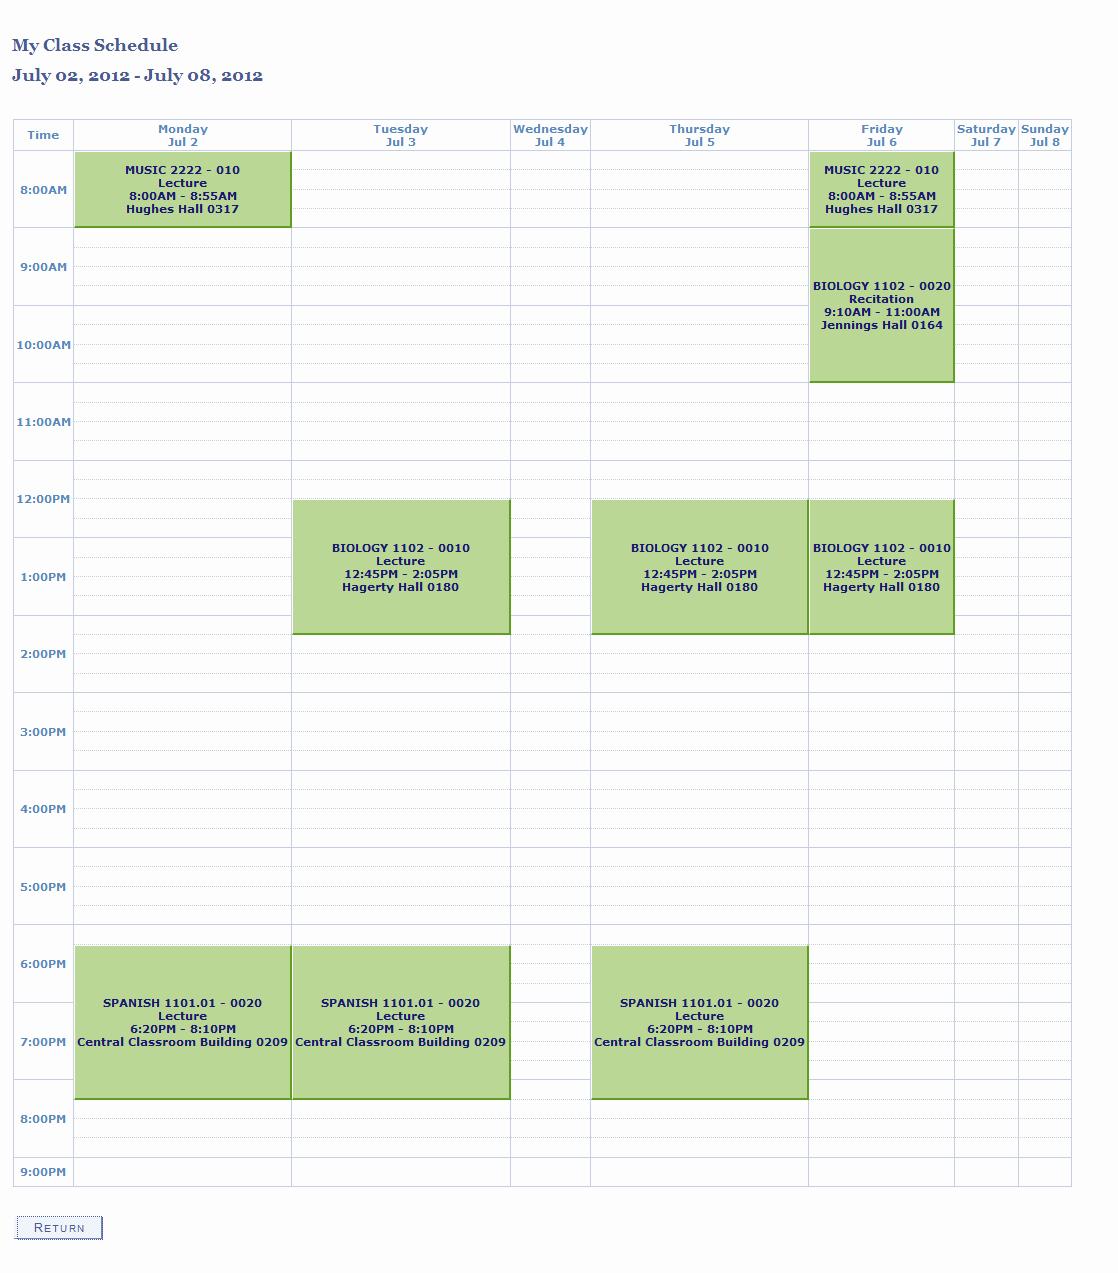 Weekly College Schedule Template Luxury Weekly Class Schedule Maker